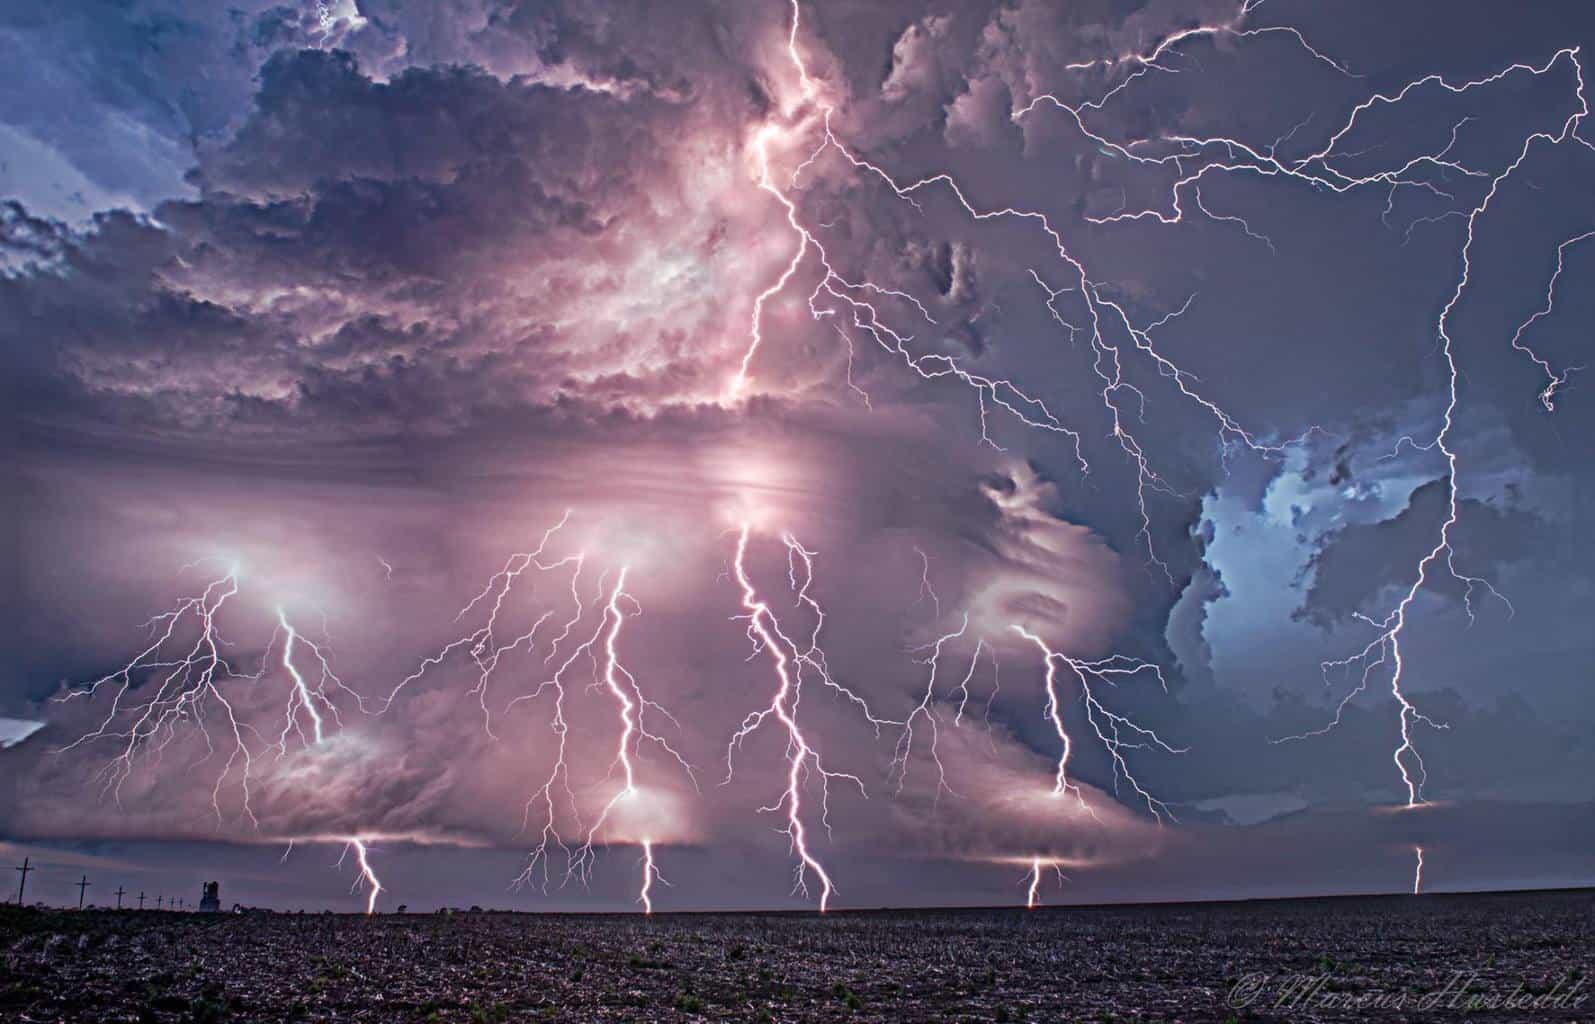 Five image lightning stack of the Selden, KS supercell on June 4, 2015.